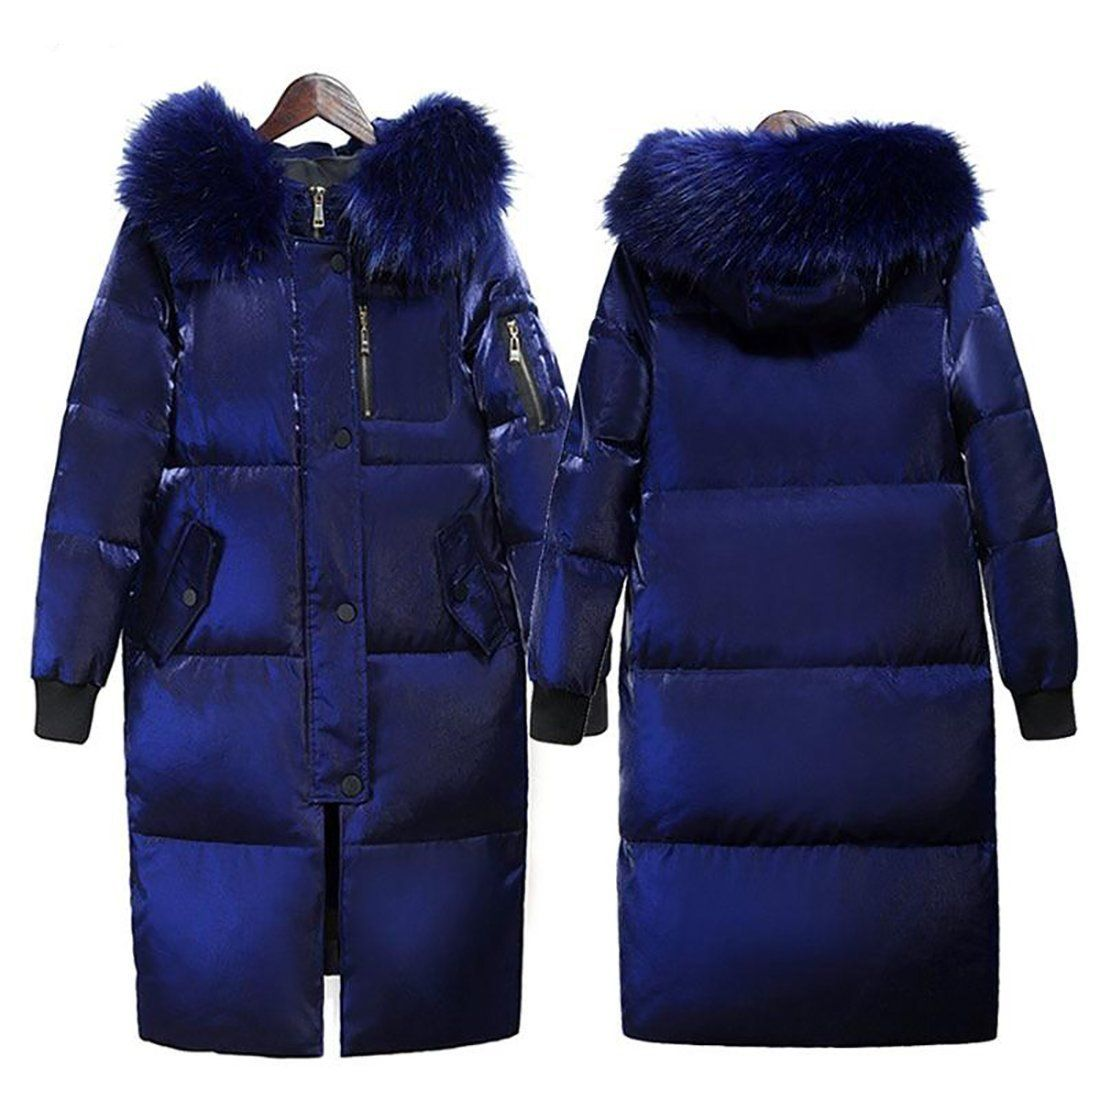 Winter  Women Fur Collar Long Down Jacket Thicken Coat Hooded Parkas Coat lot